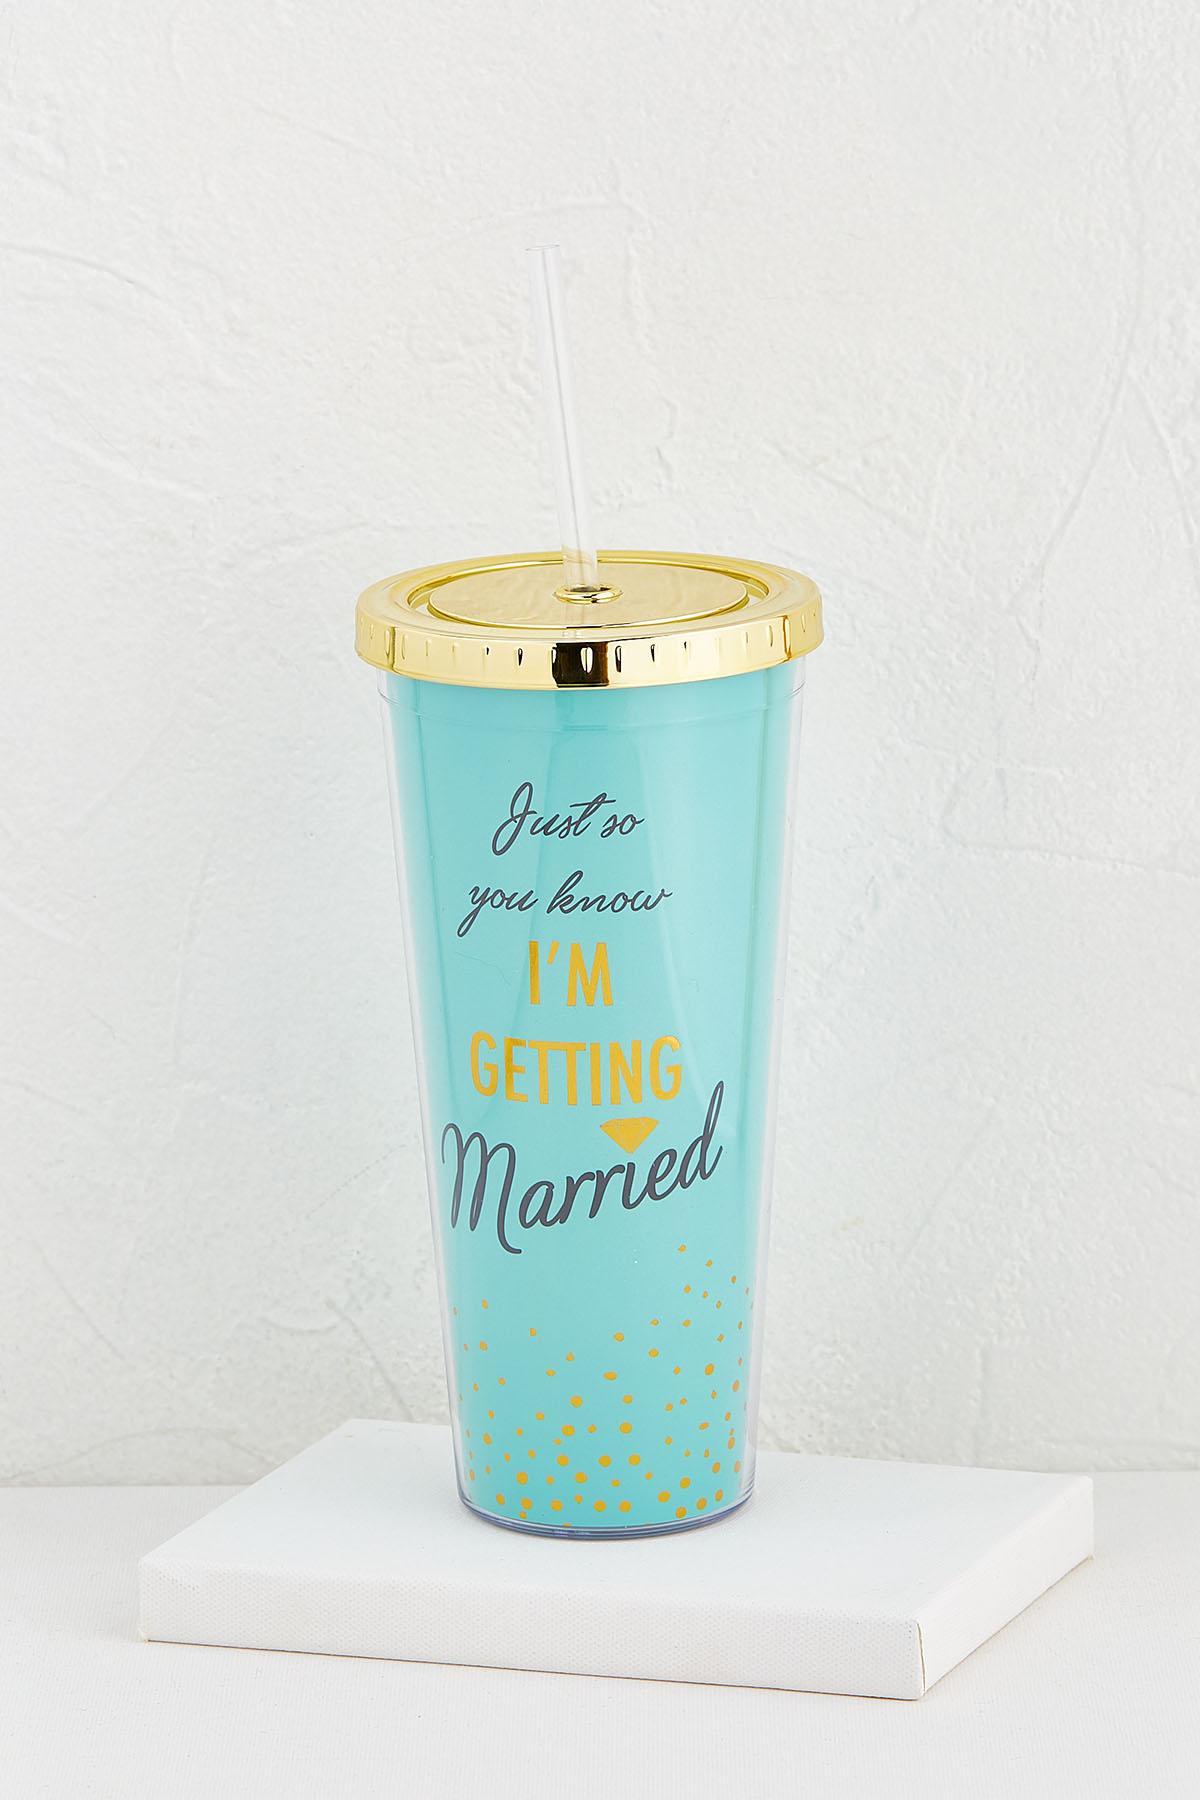 Getting Married Tumbler